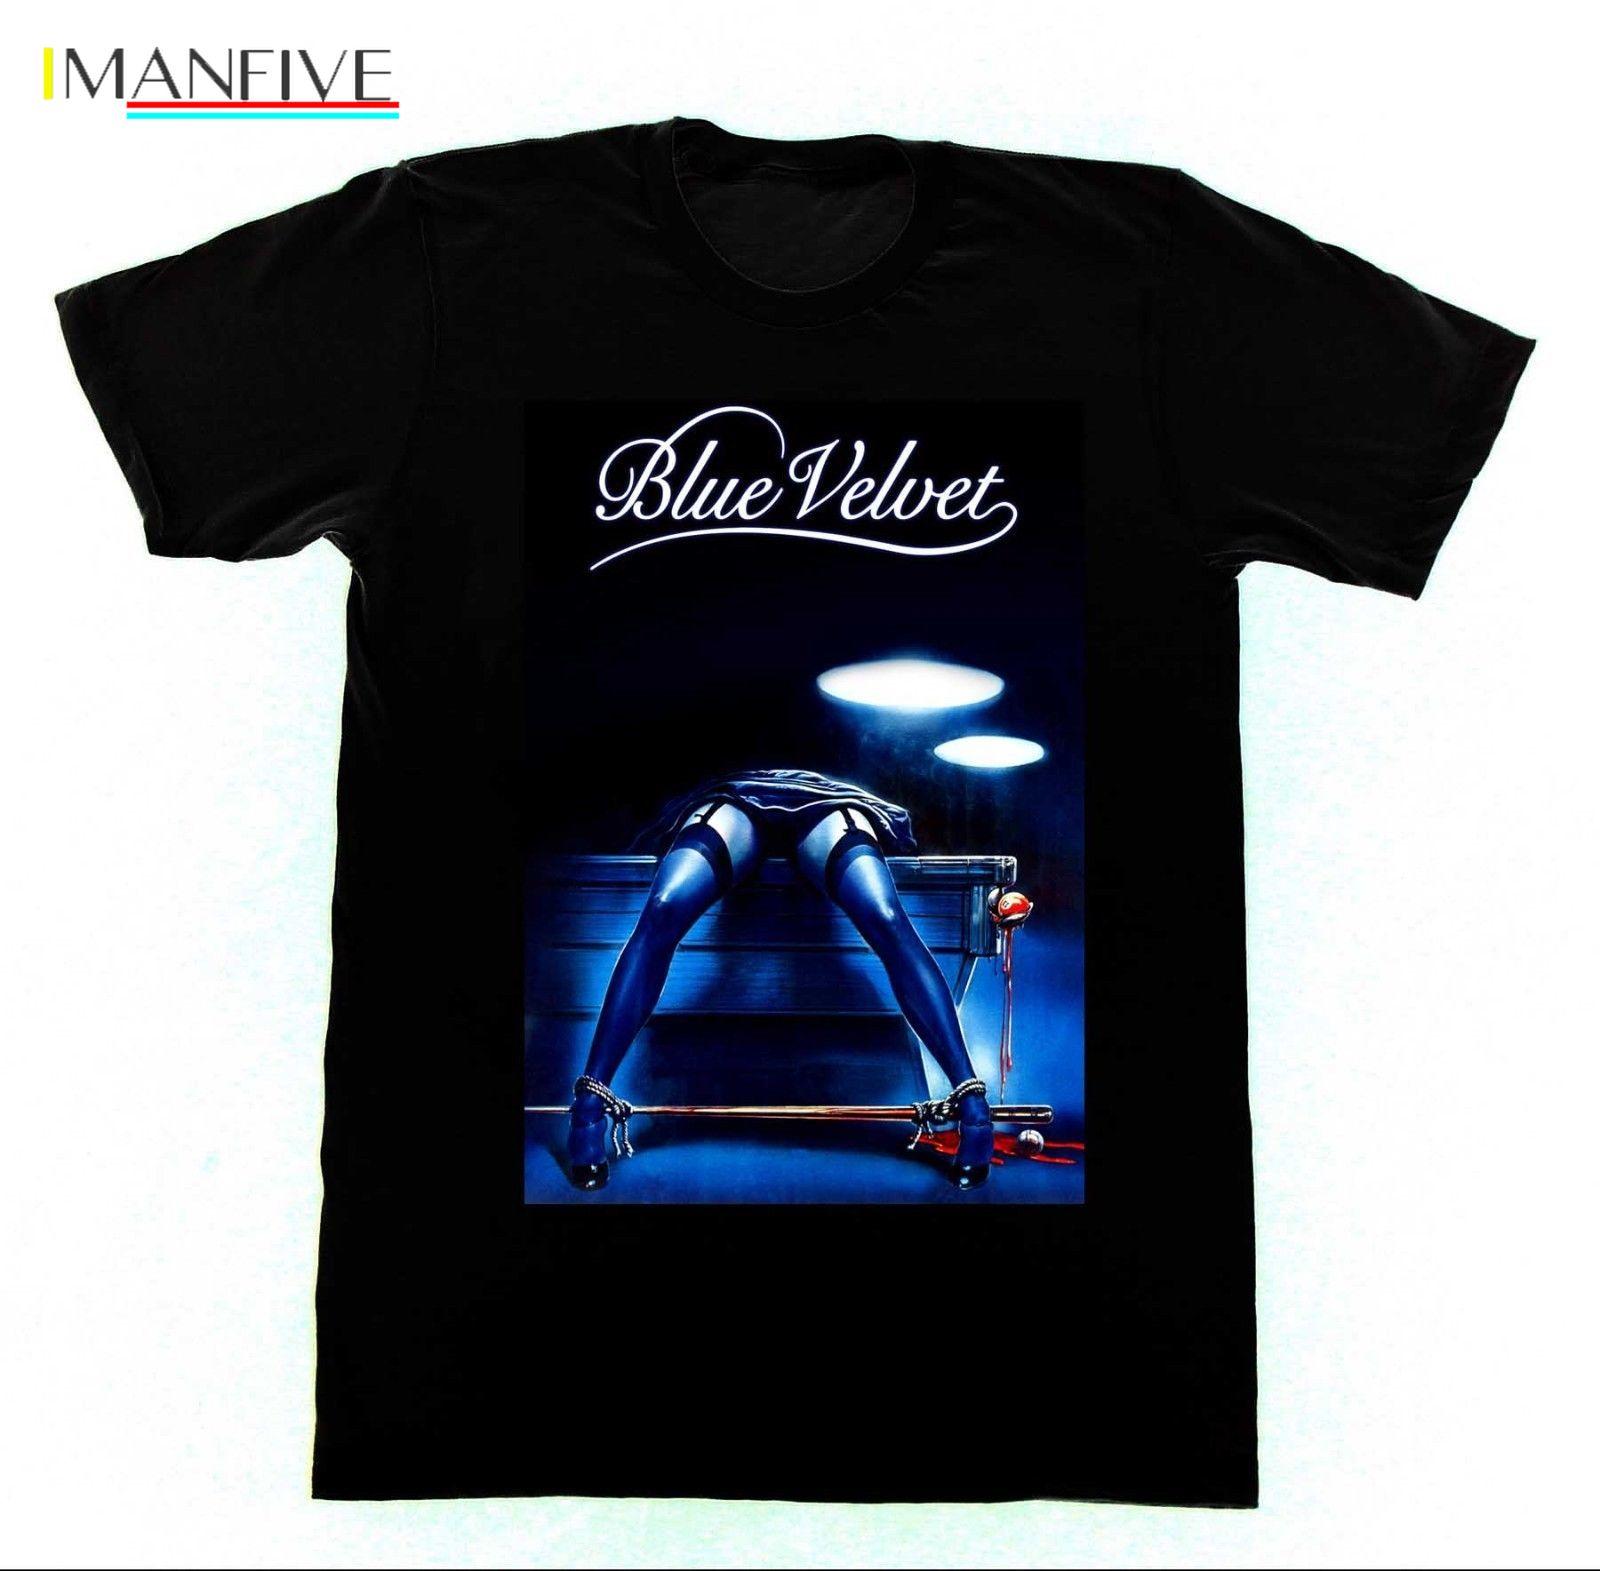 Blue Velvet David Lynch Tshirt 41 T Shirt Cult Film BDSM Bondage Erotica Pre Cotton Tee Shirt For Men in T Shirts from Men 39 s Clothing